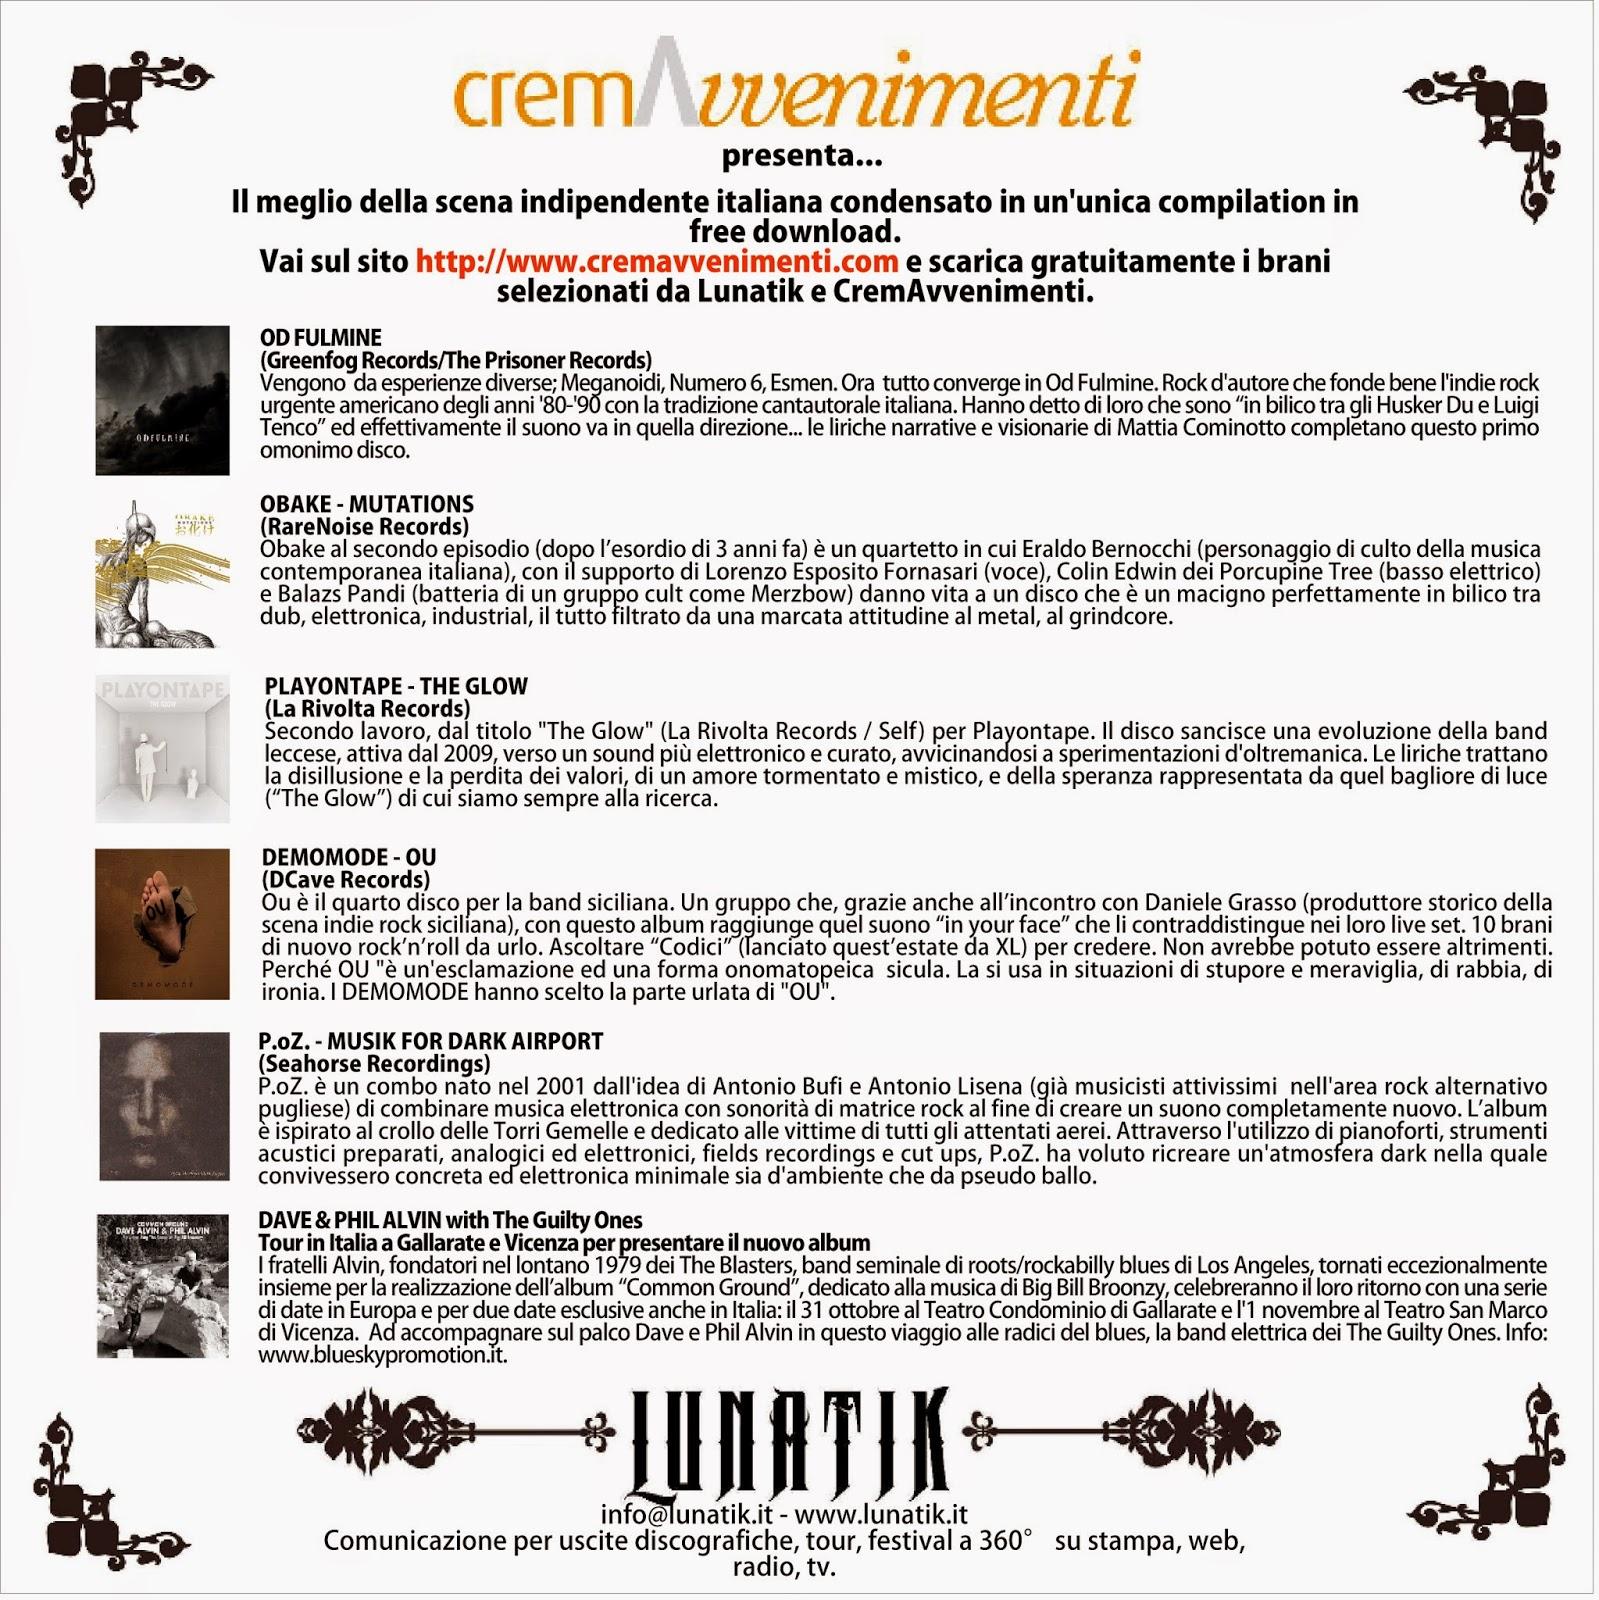 https://soundcloud.com/maggio_quattro/sets/compilation-ottobre-2014/s-V9yKG